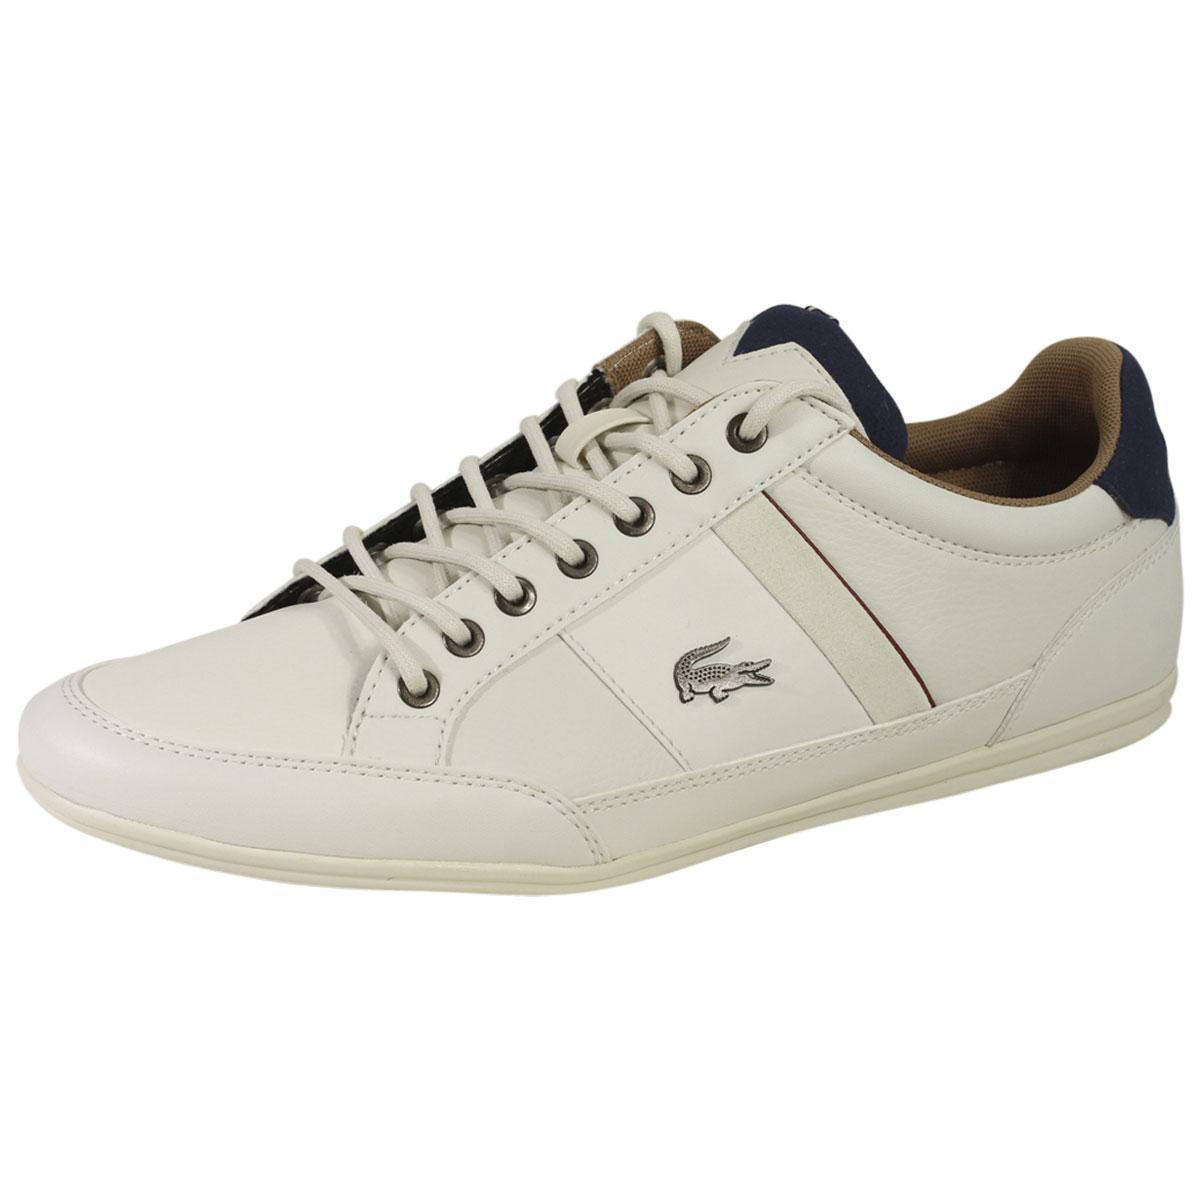 37965c6b8266 Lacoste Men s Chaymon-118 Low-Top Sneakers Shoes